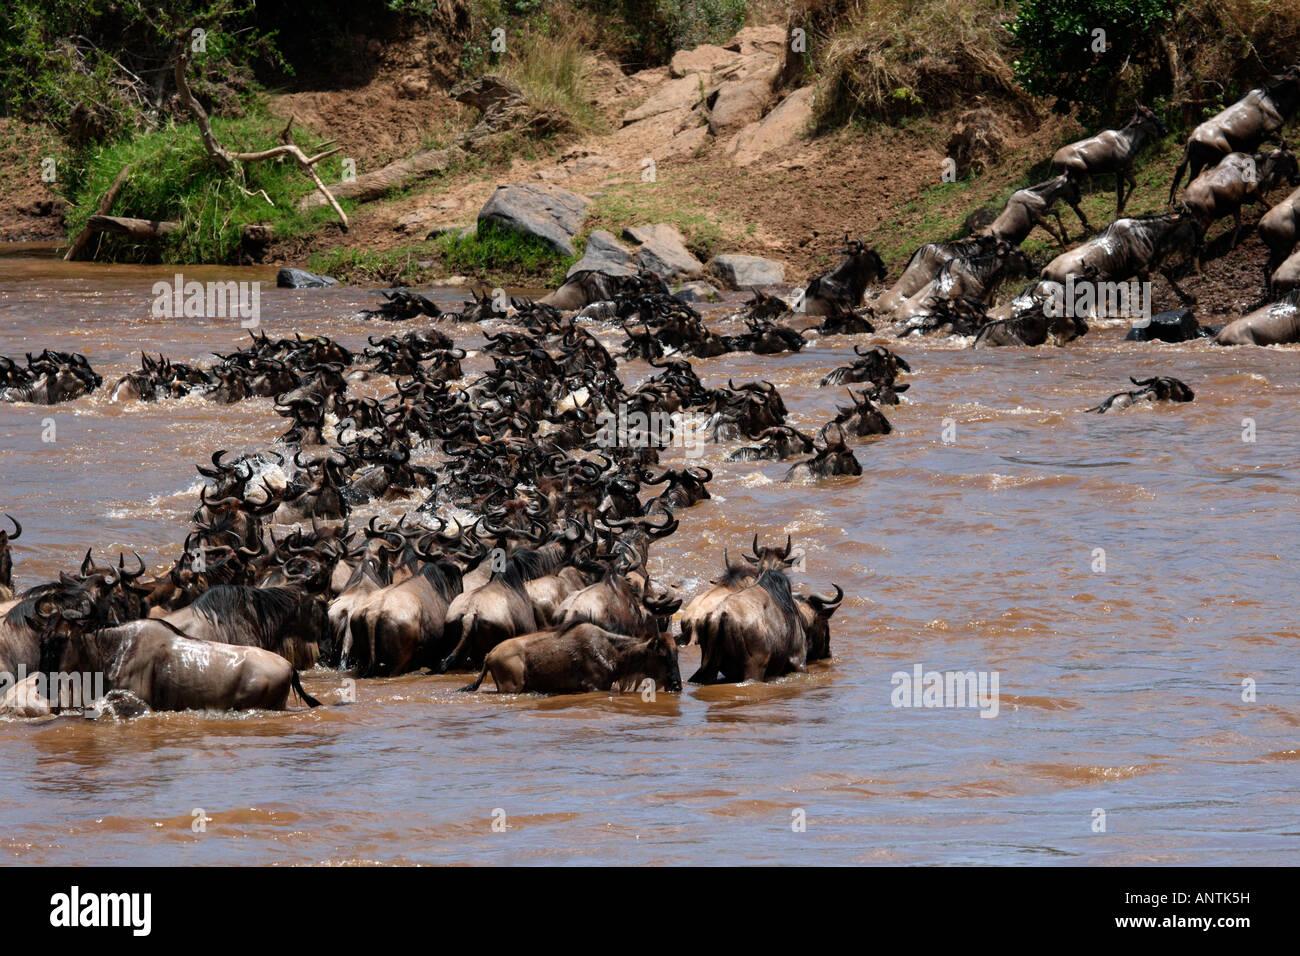 The Great Migration Wildebeast Crossing Mara River Masai Mara Kenya Africa. - Stock Image